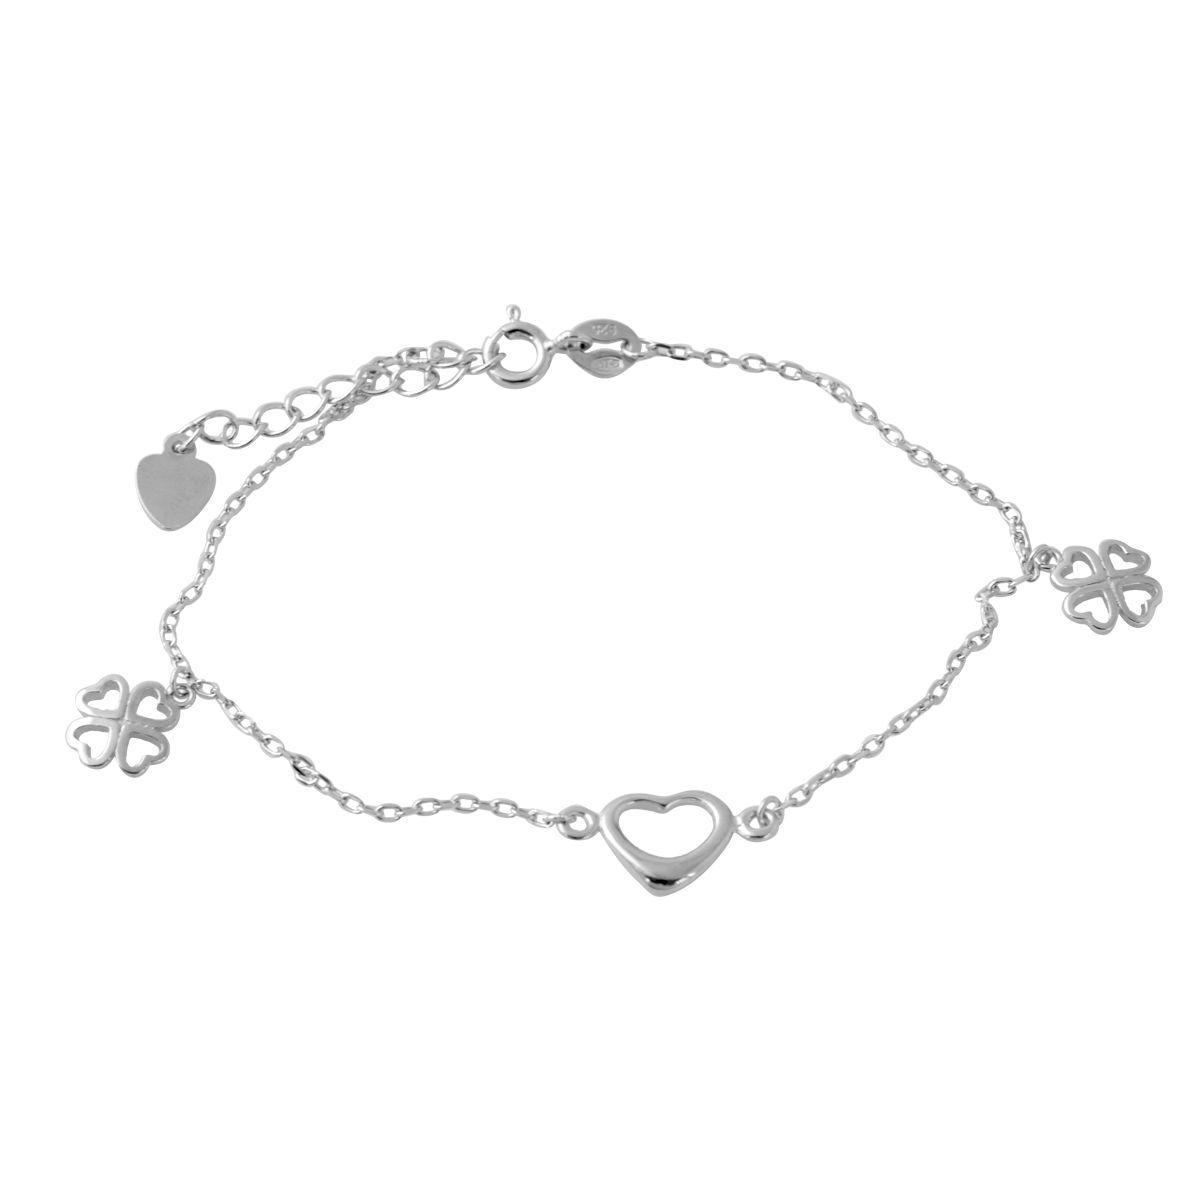 Серебряный браслет DreamJewelry без камней (2052869) 1720 размер